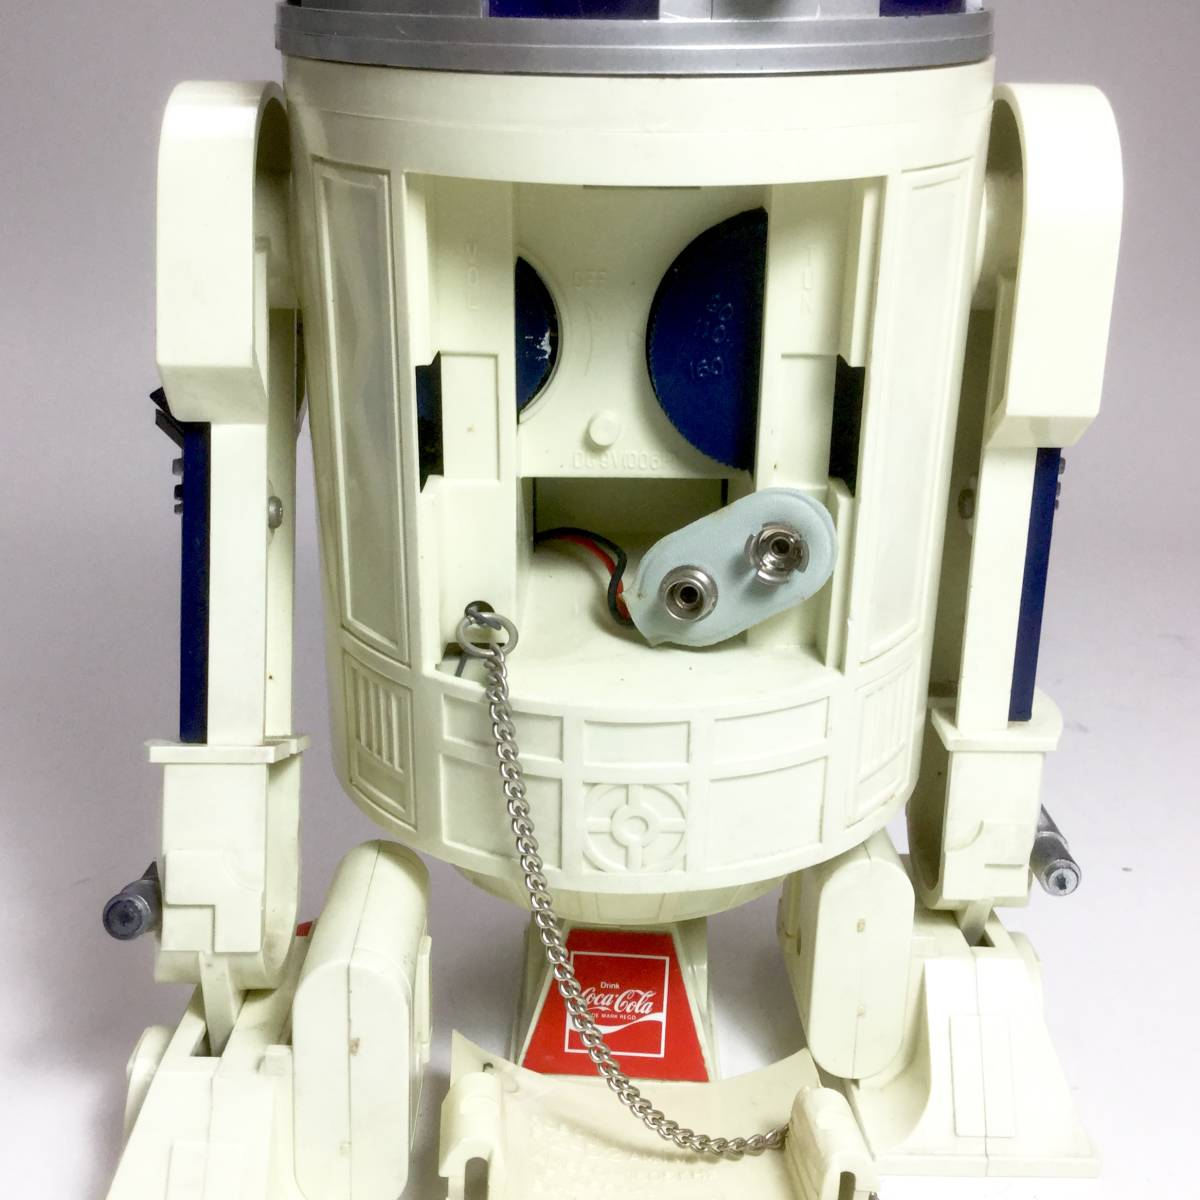 R2-D2 ラジオ 作動品 スターウォーズ 1977年版 コカコーラ 懸賞品 非売品 レトロ ビンテージ _画像9